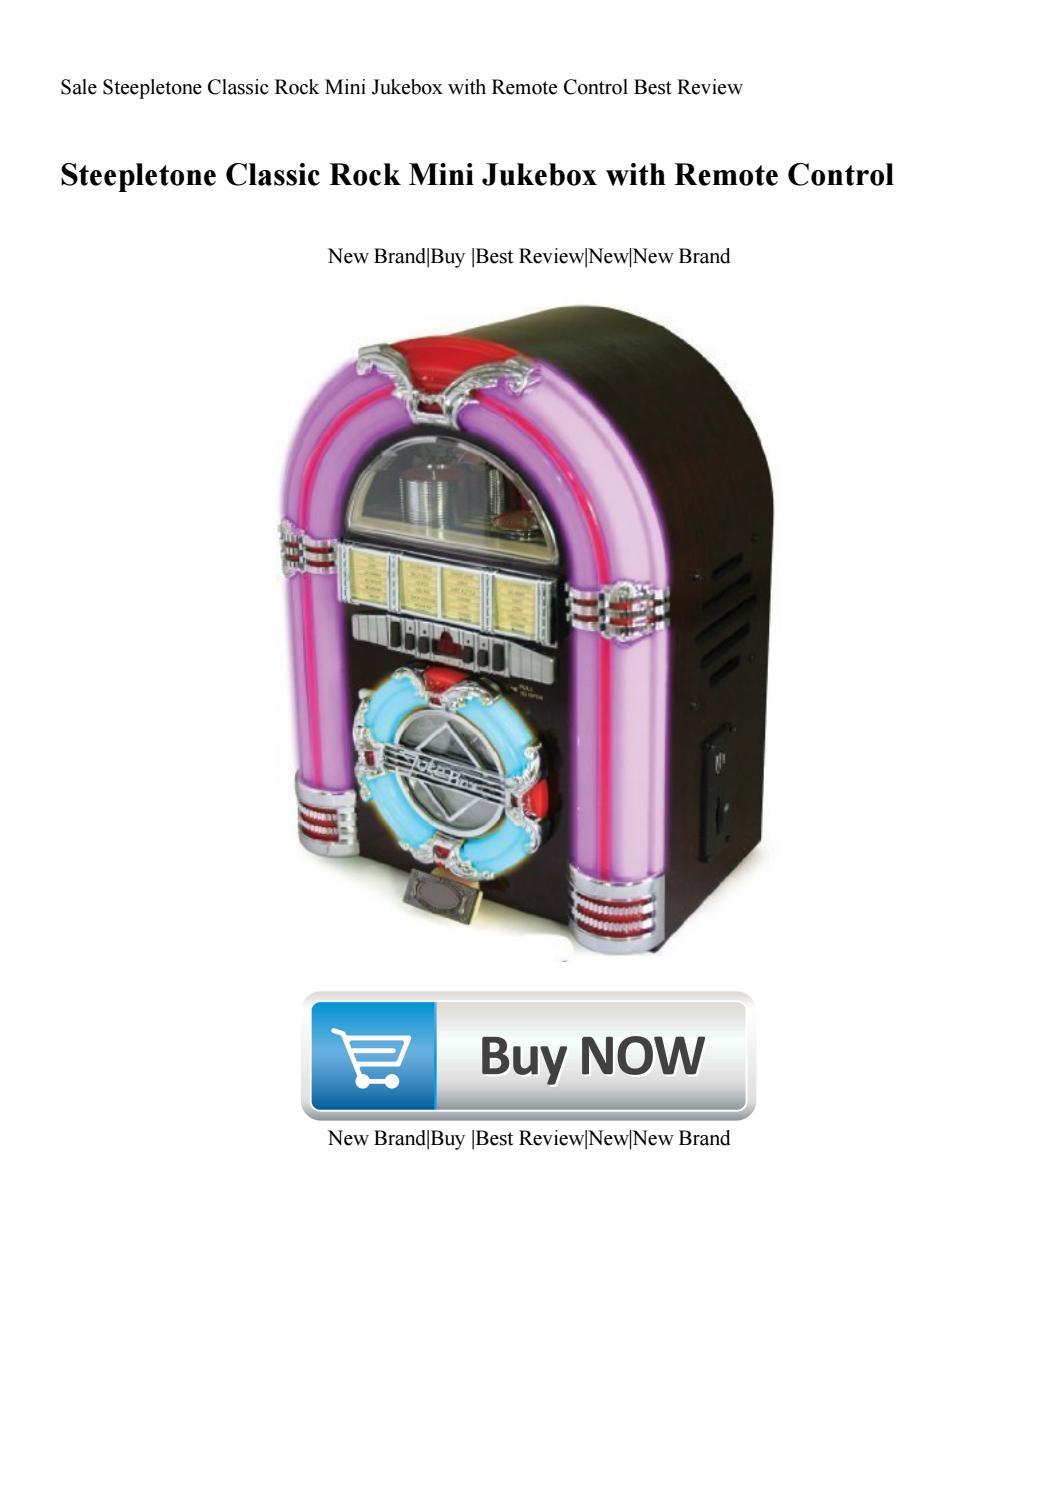 Sale Steepletone Classic Rock Mini Jukebox with Remote